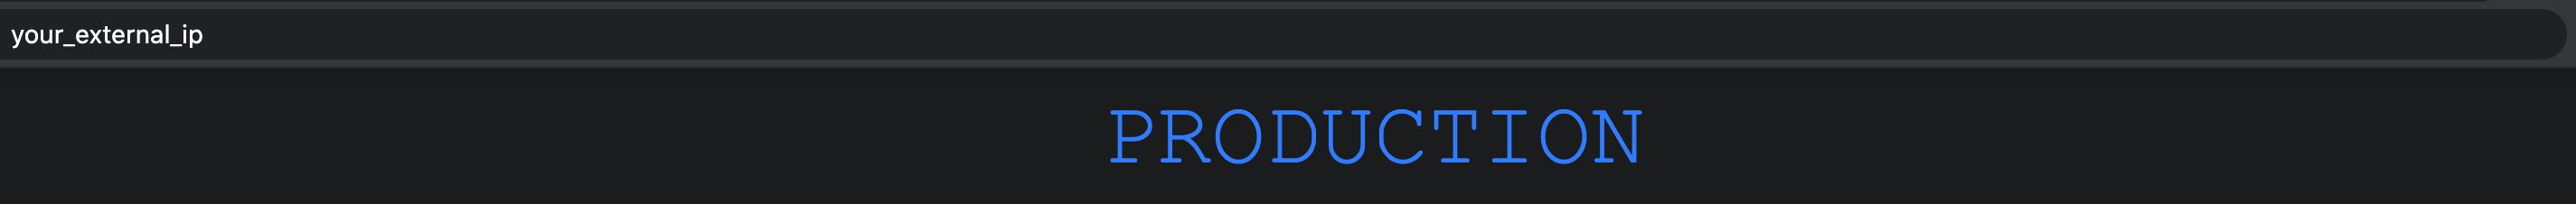 sammy-app in production